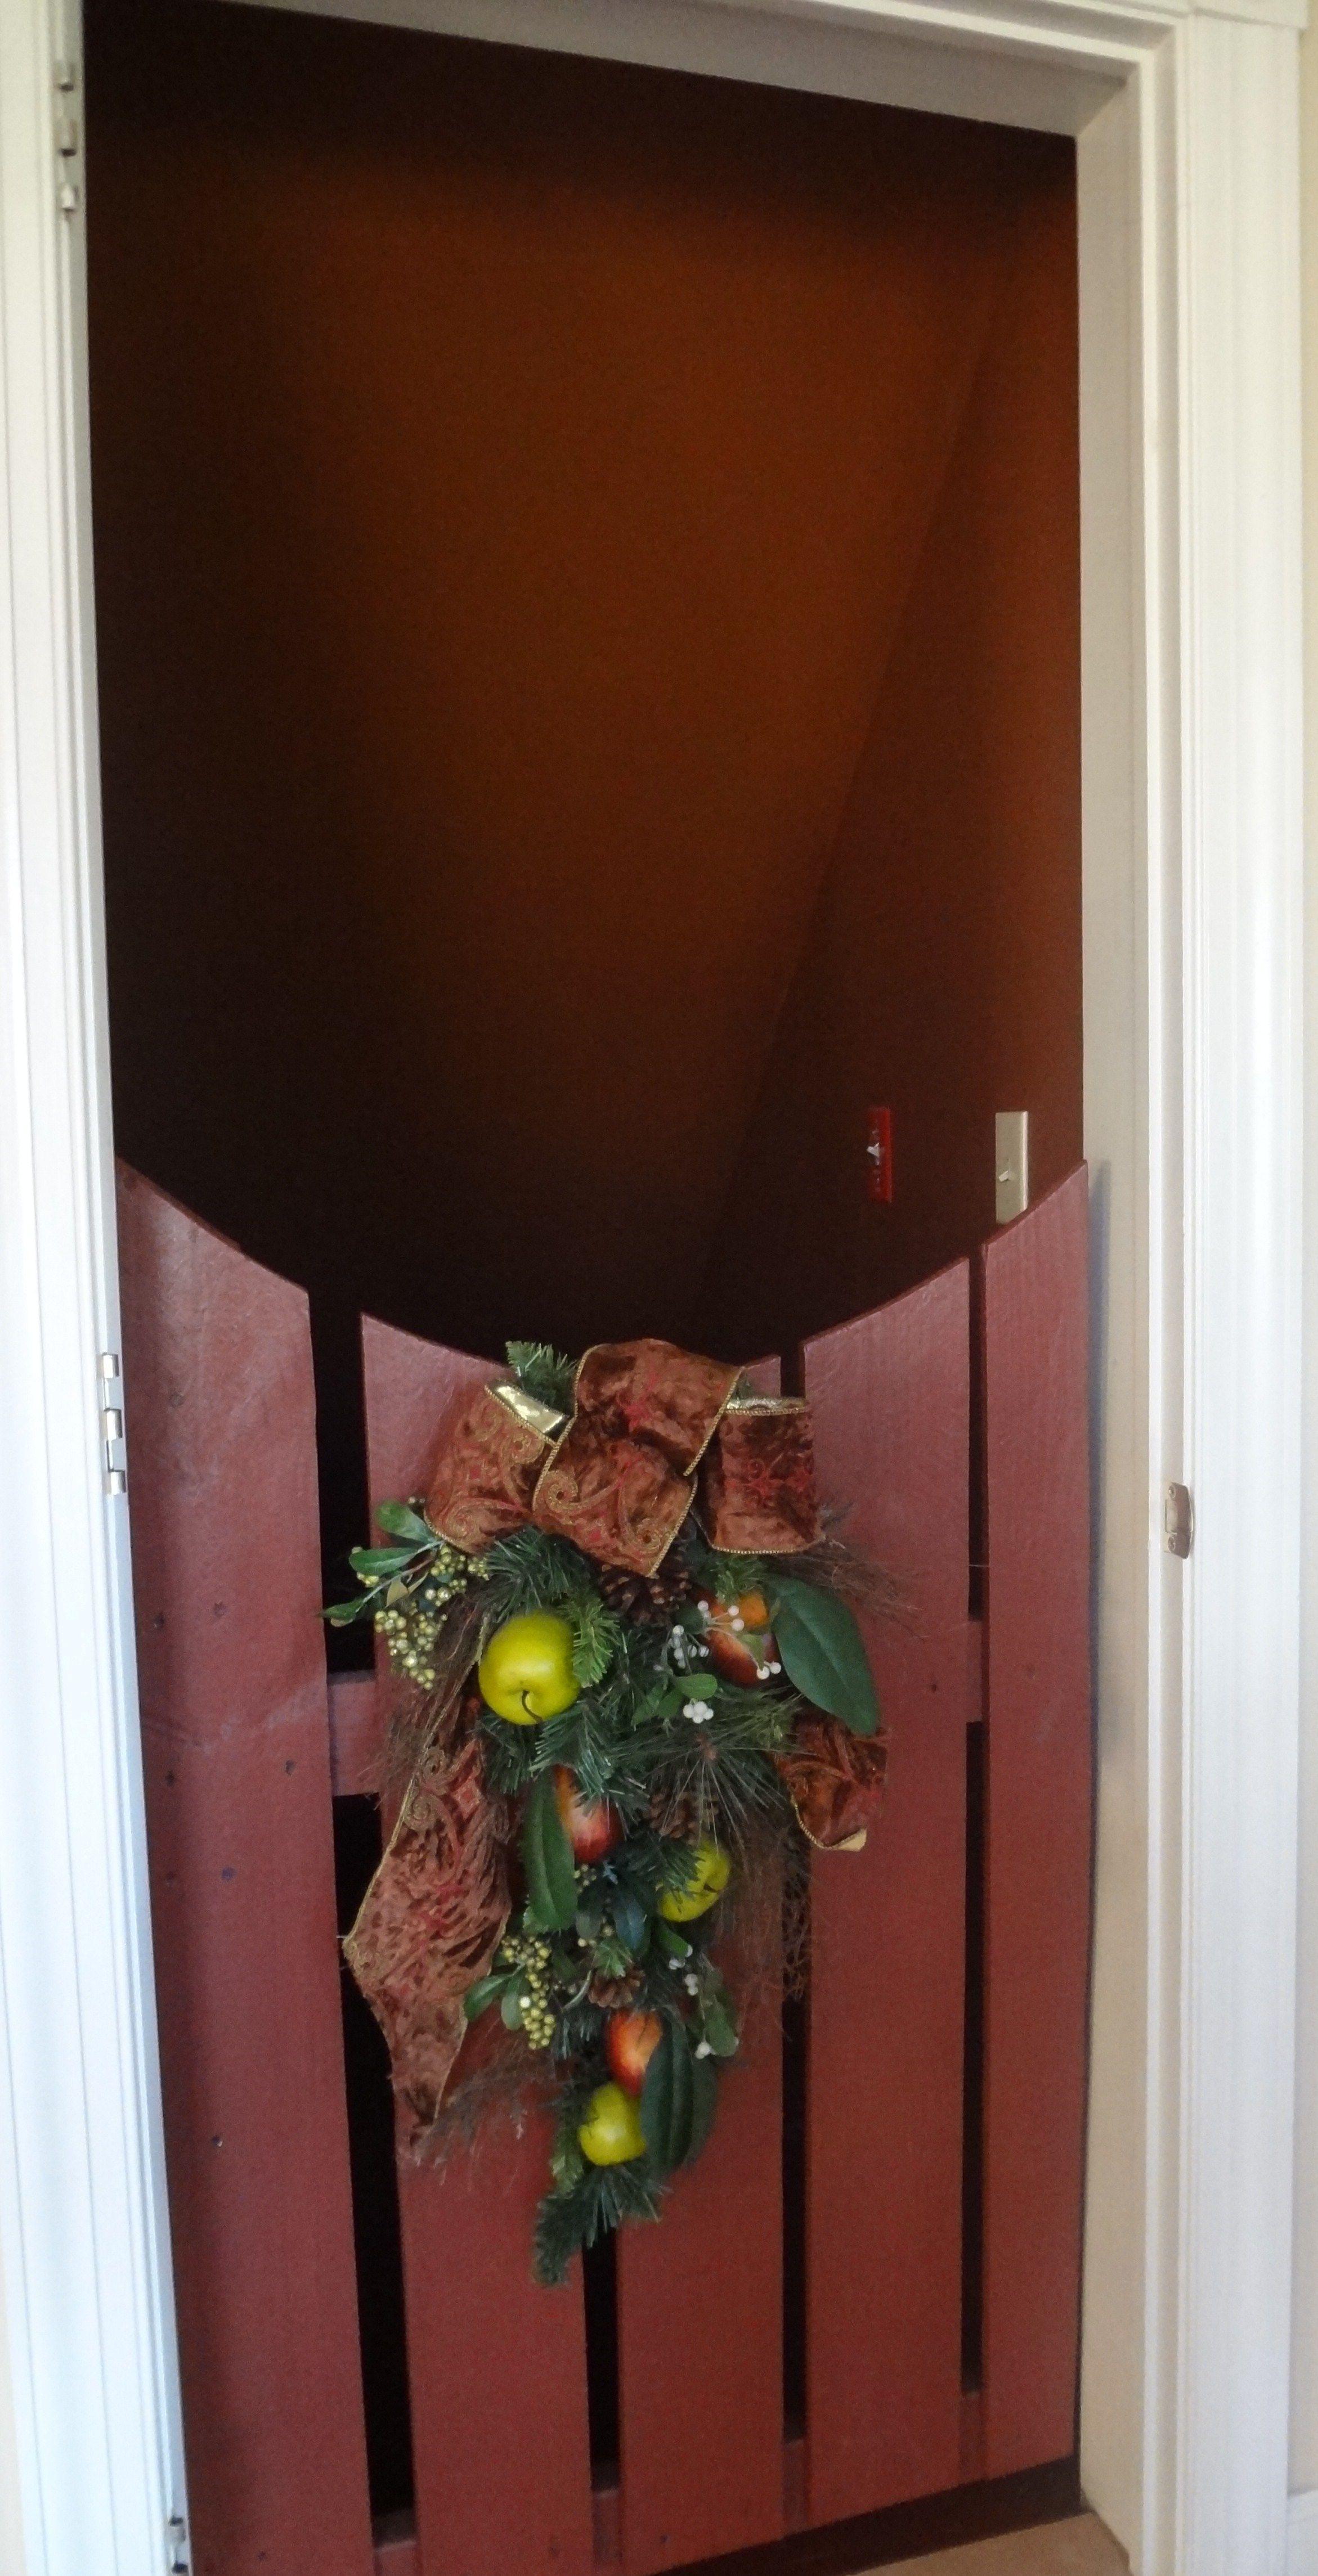 Basement Room Door Ideas: We Replaced Our Basement Door With A Cute Gate.